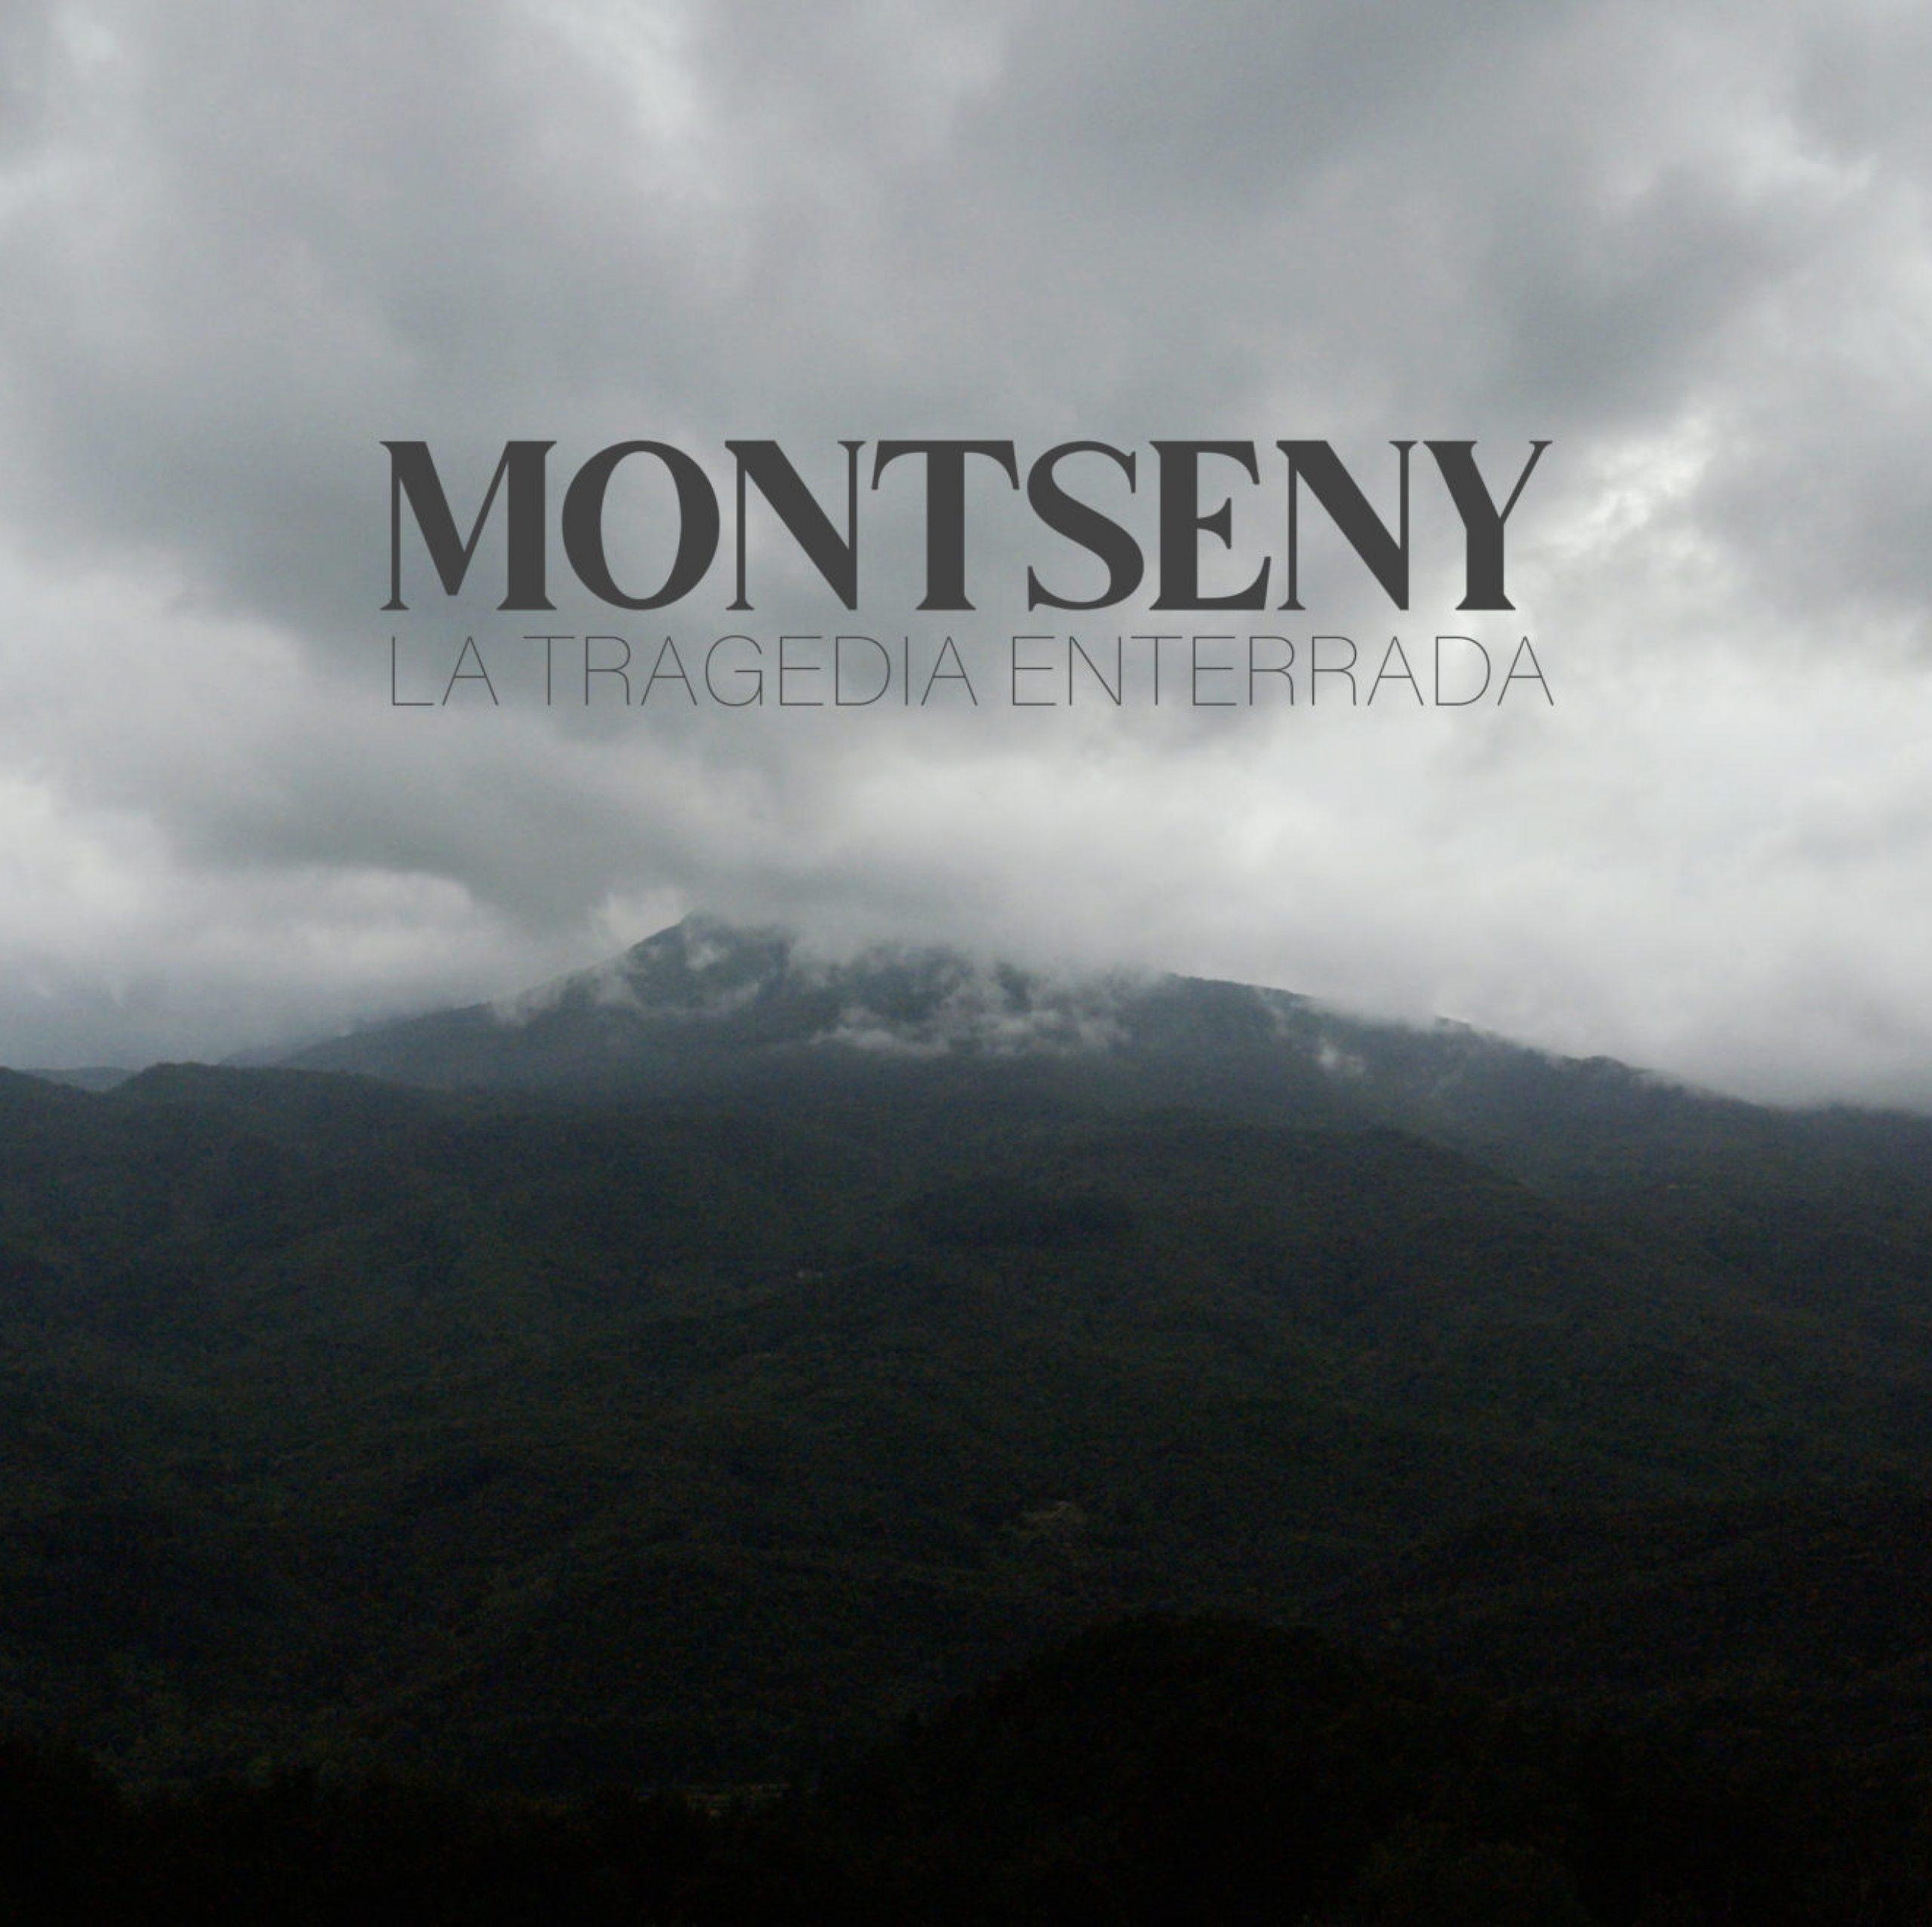 Montseny. la tragedia enterrada